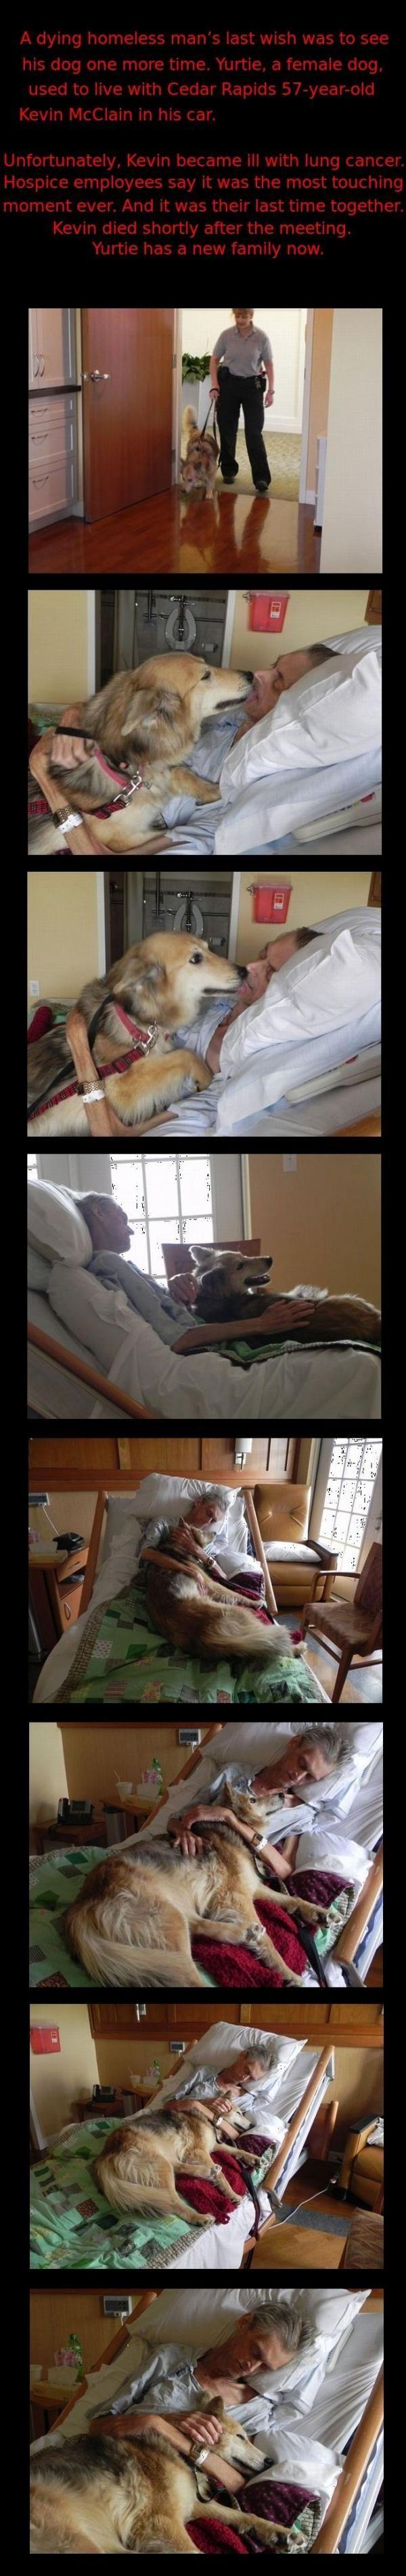 A dying man's last wish. Dog love <3